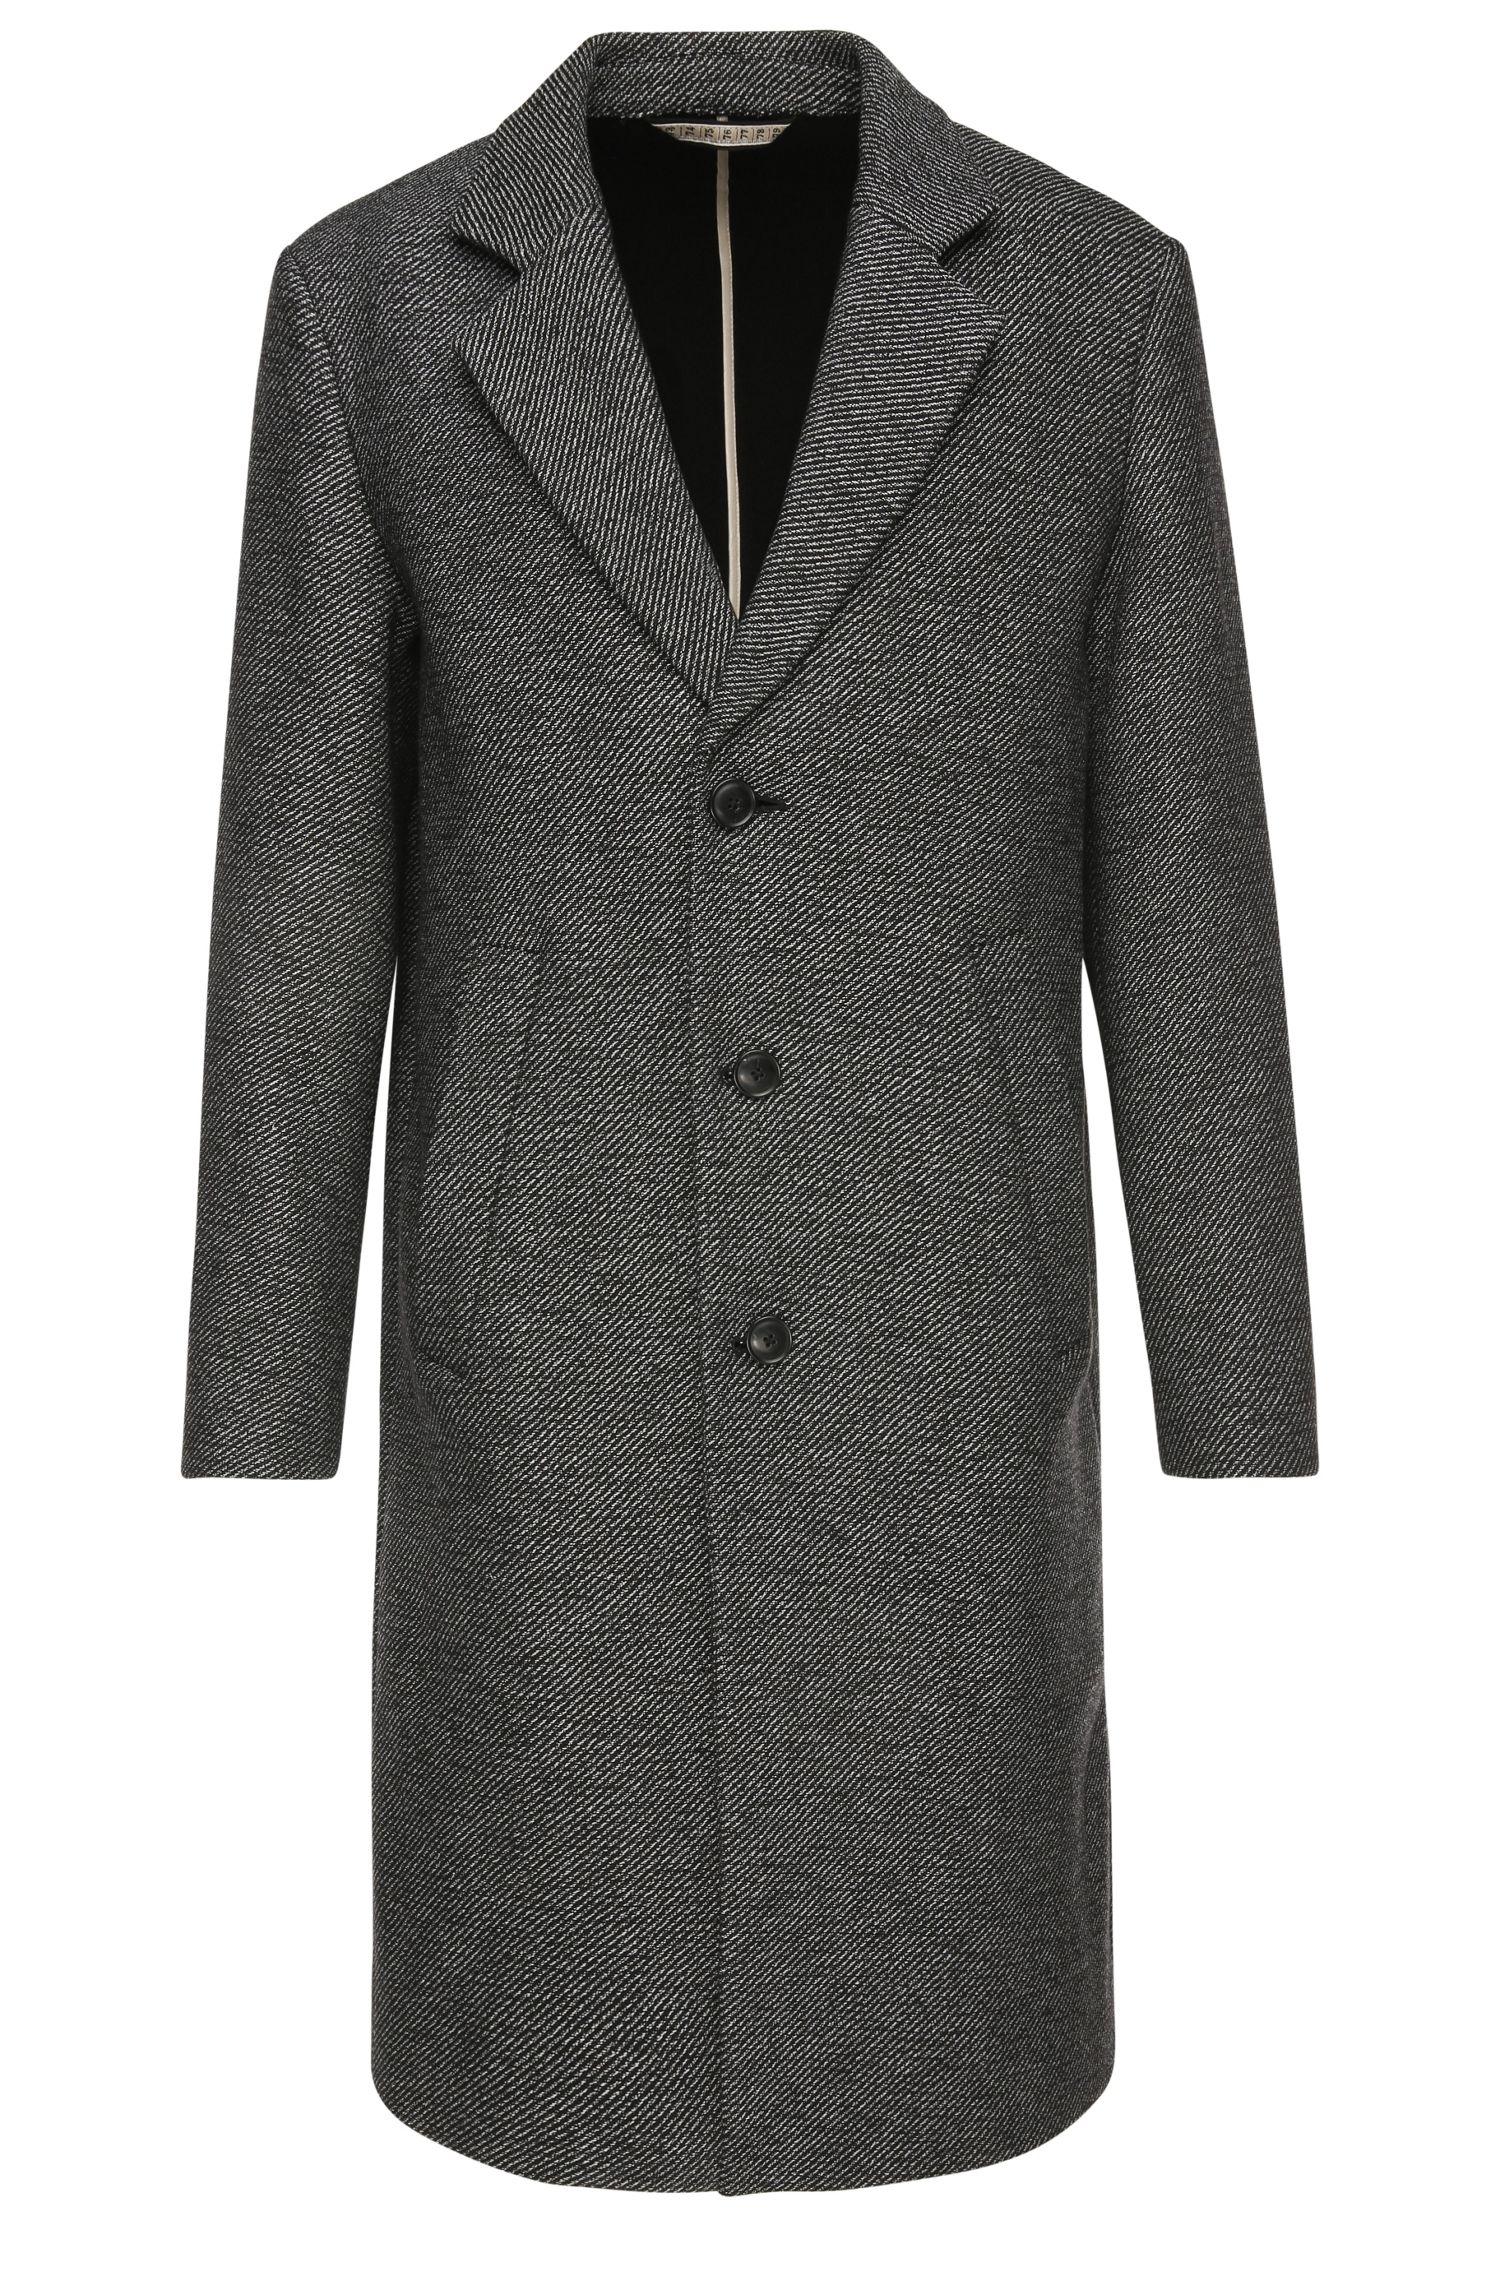 'Bear' | Wool Cotton Blend Double Twill Coat